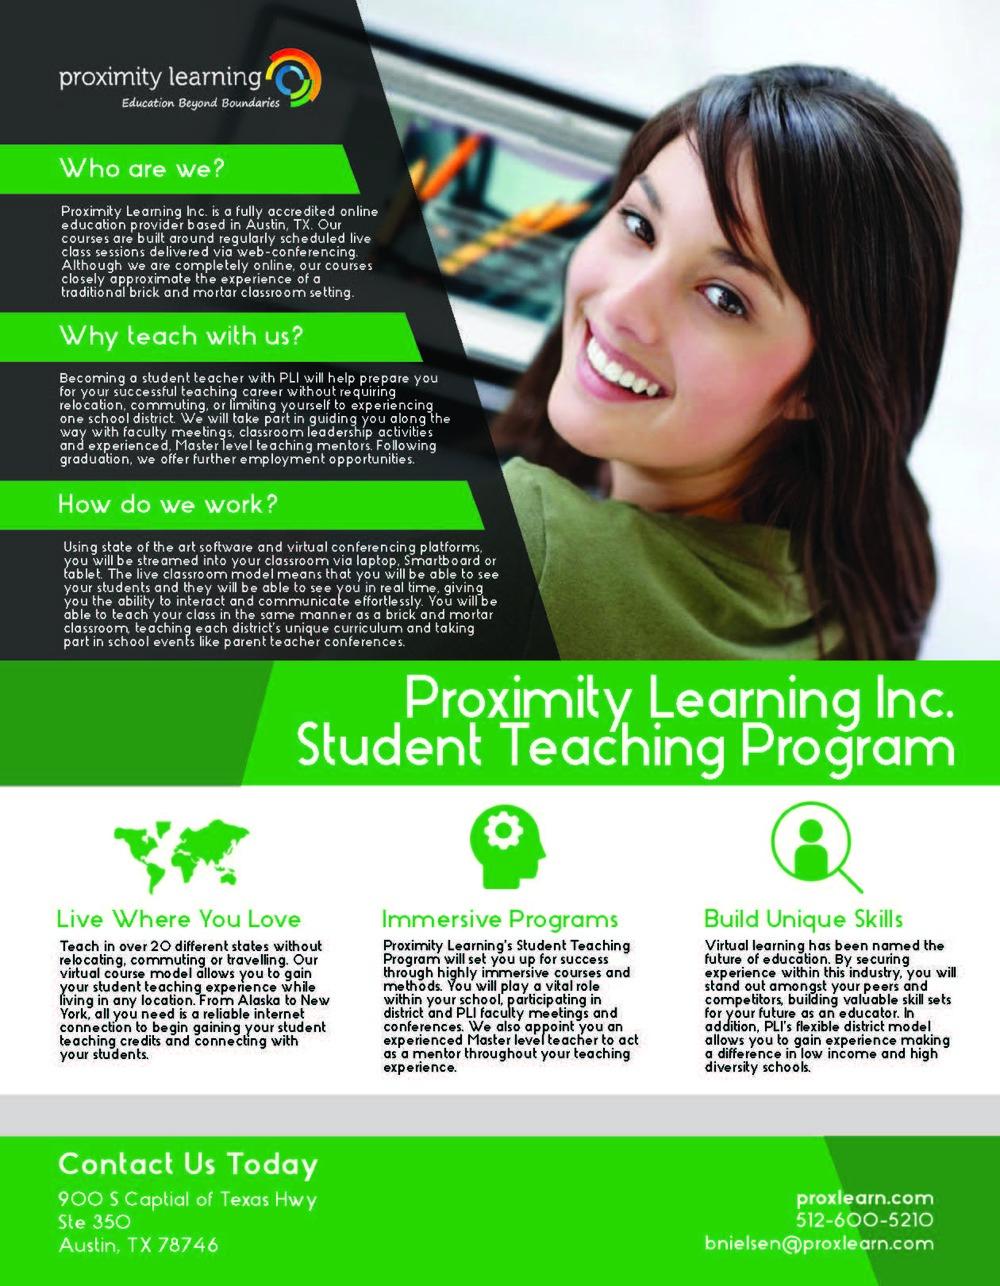 Student Teaching Program